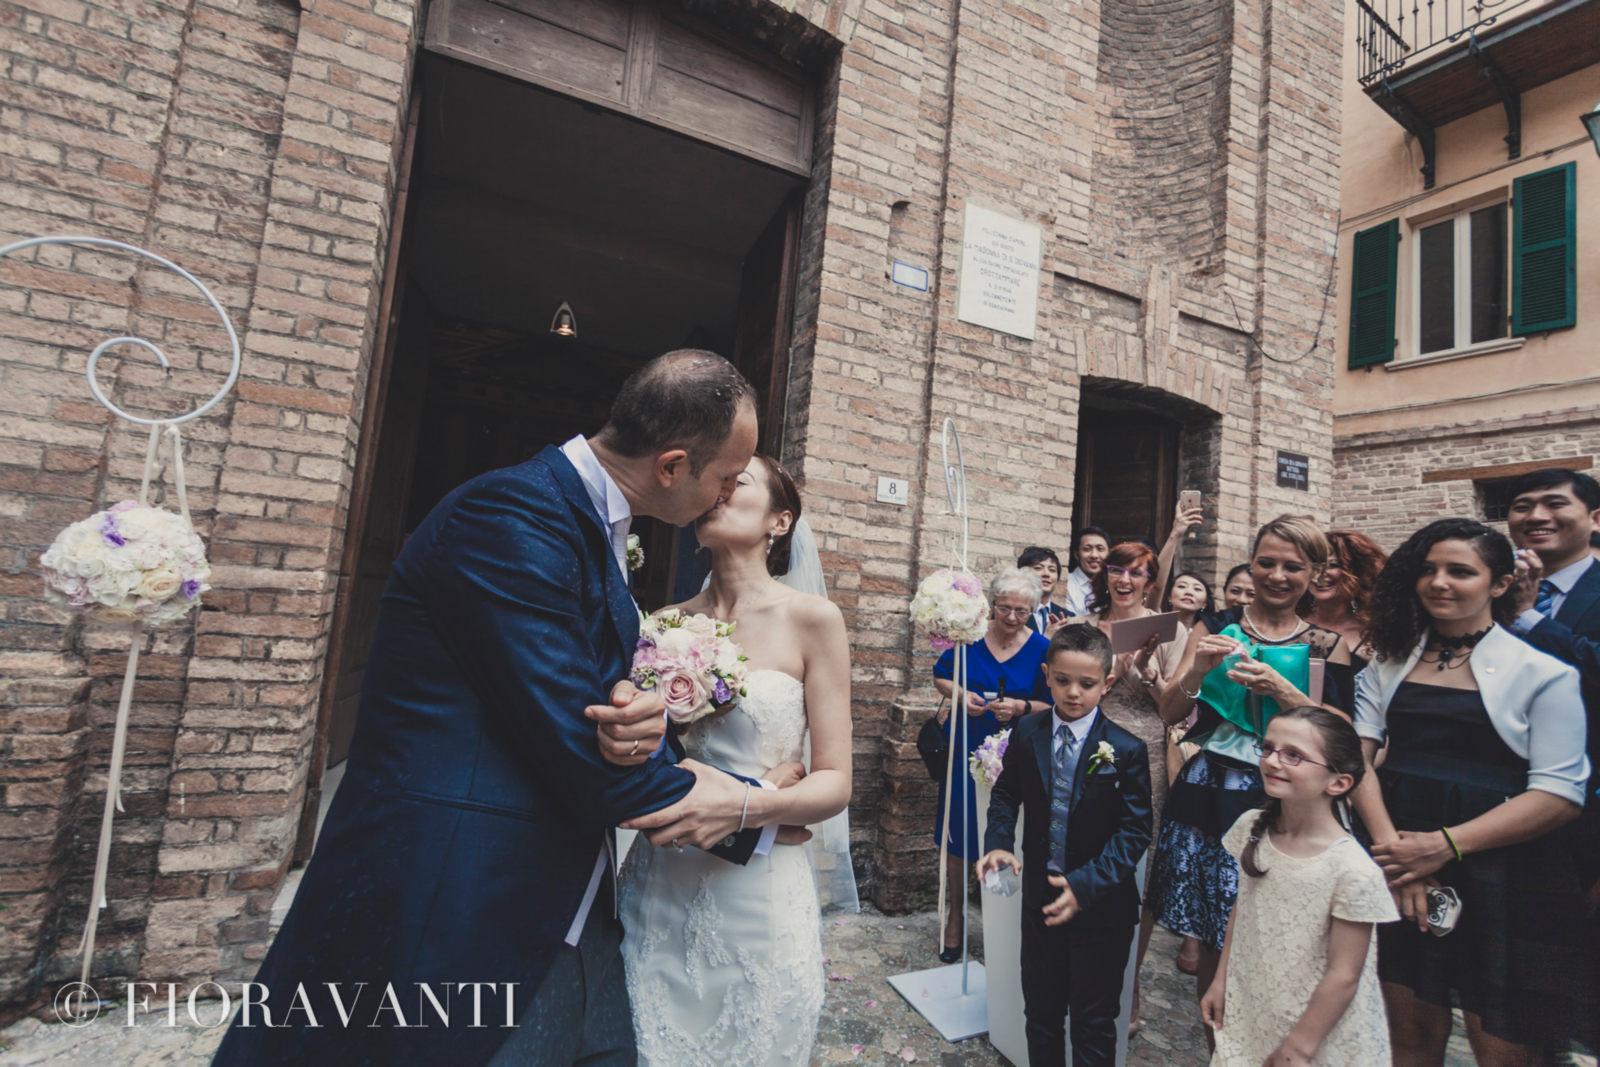 Ashley&Francesco Studio Fotografico Fioravanti Ascoli Piceno